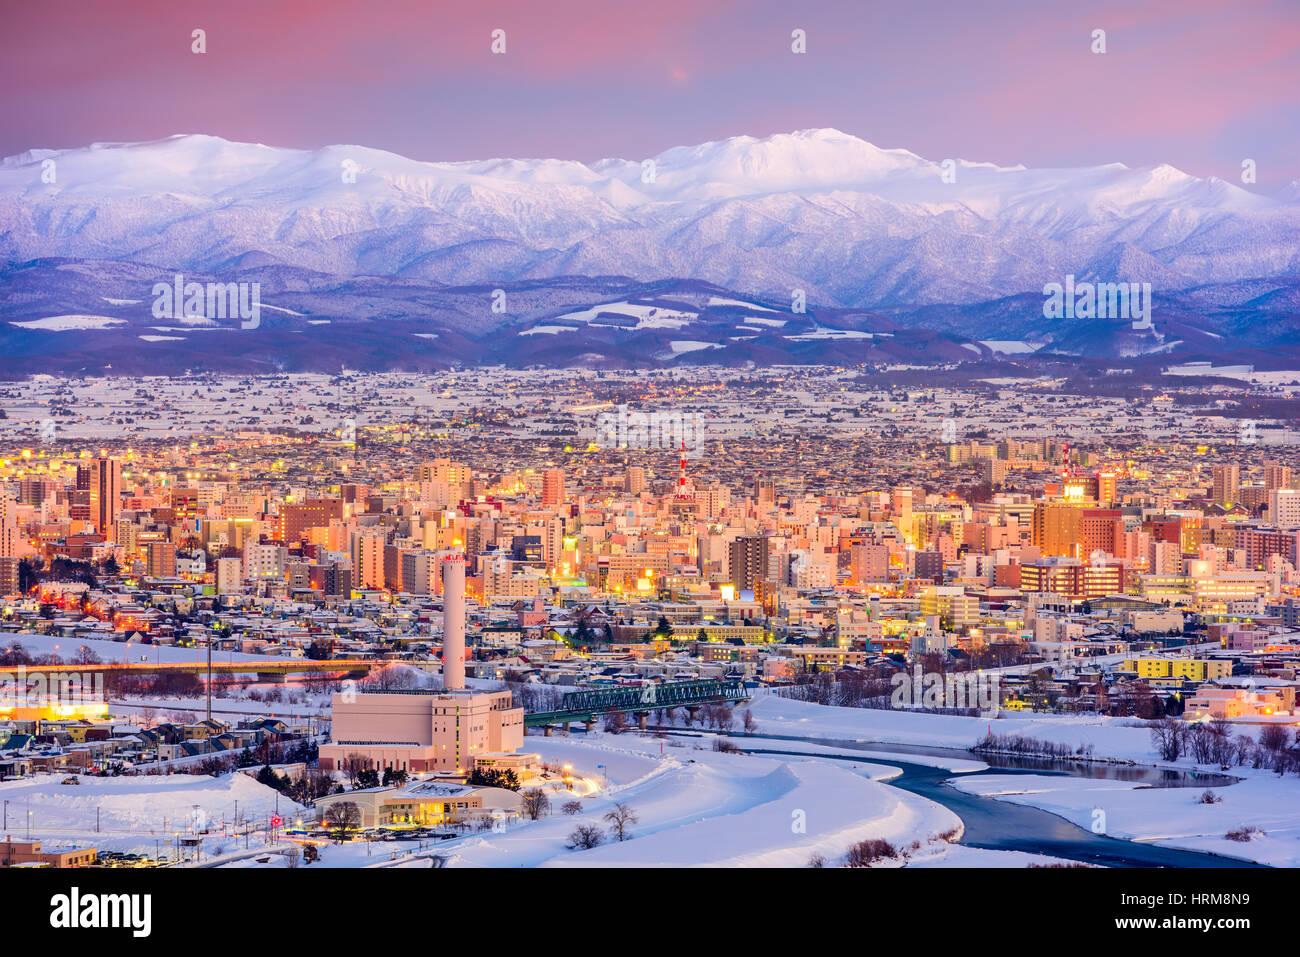 Asahikawa, Hokkaido au Japon dans la ville d'hiver. Photo Stock